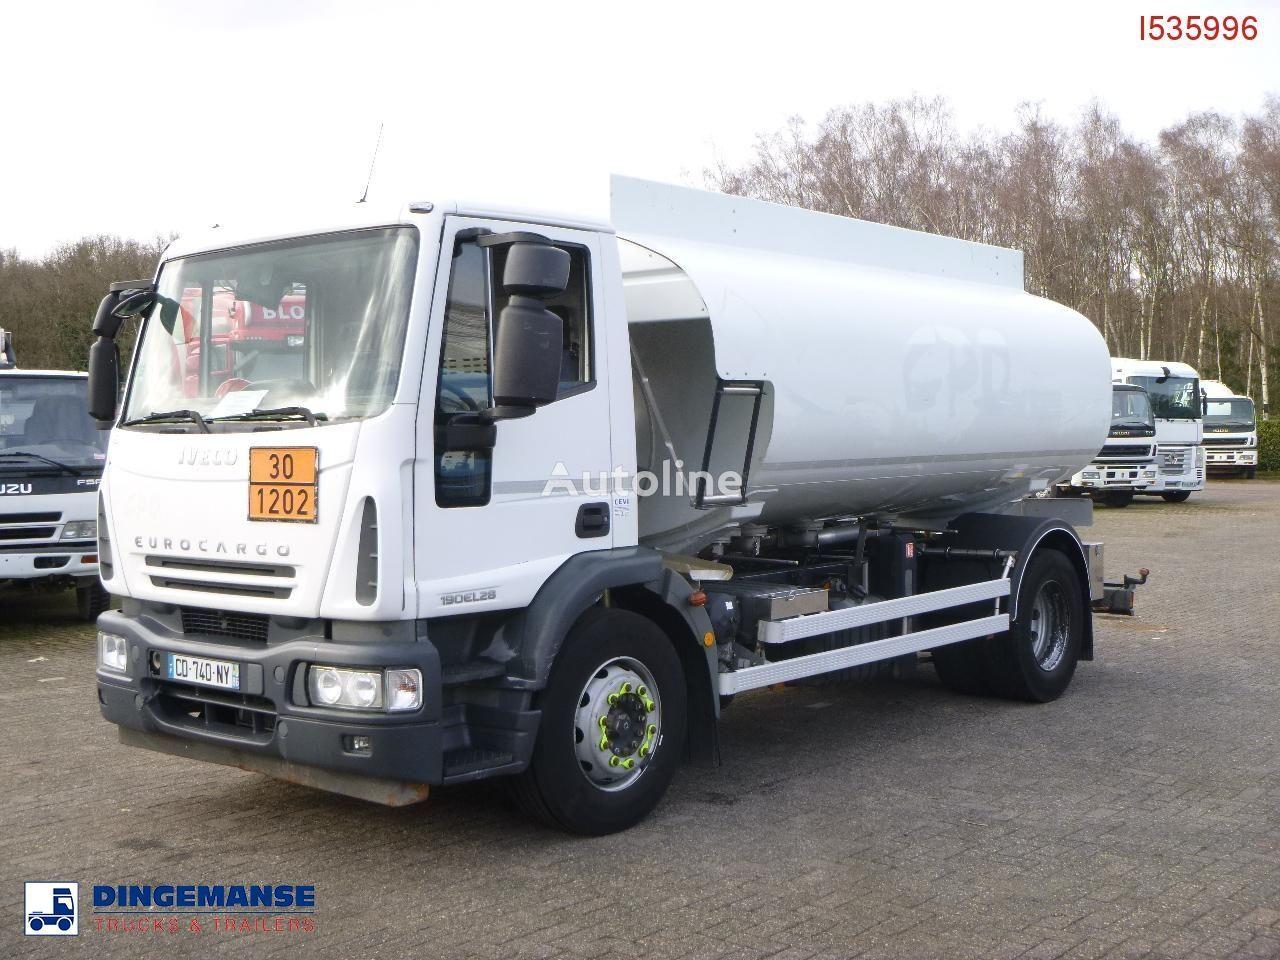 IVECO Eurocargo ML190EL28 4x2 fuel tank 13.7 m3 / 4 comp kamion cisterna za gorivo